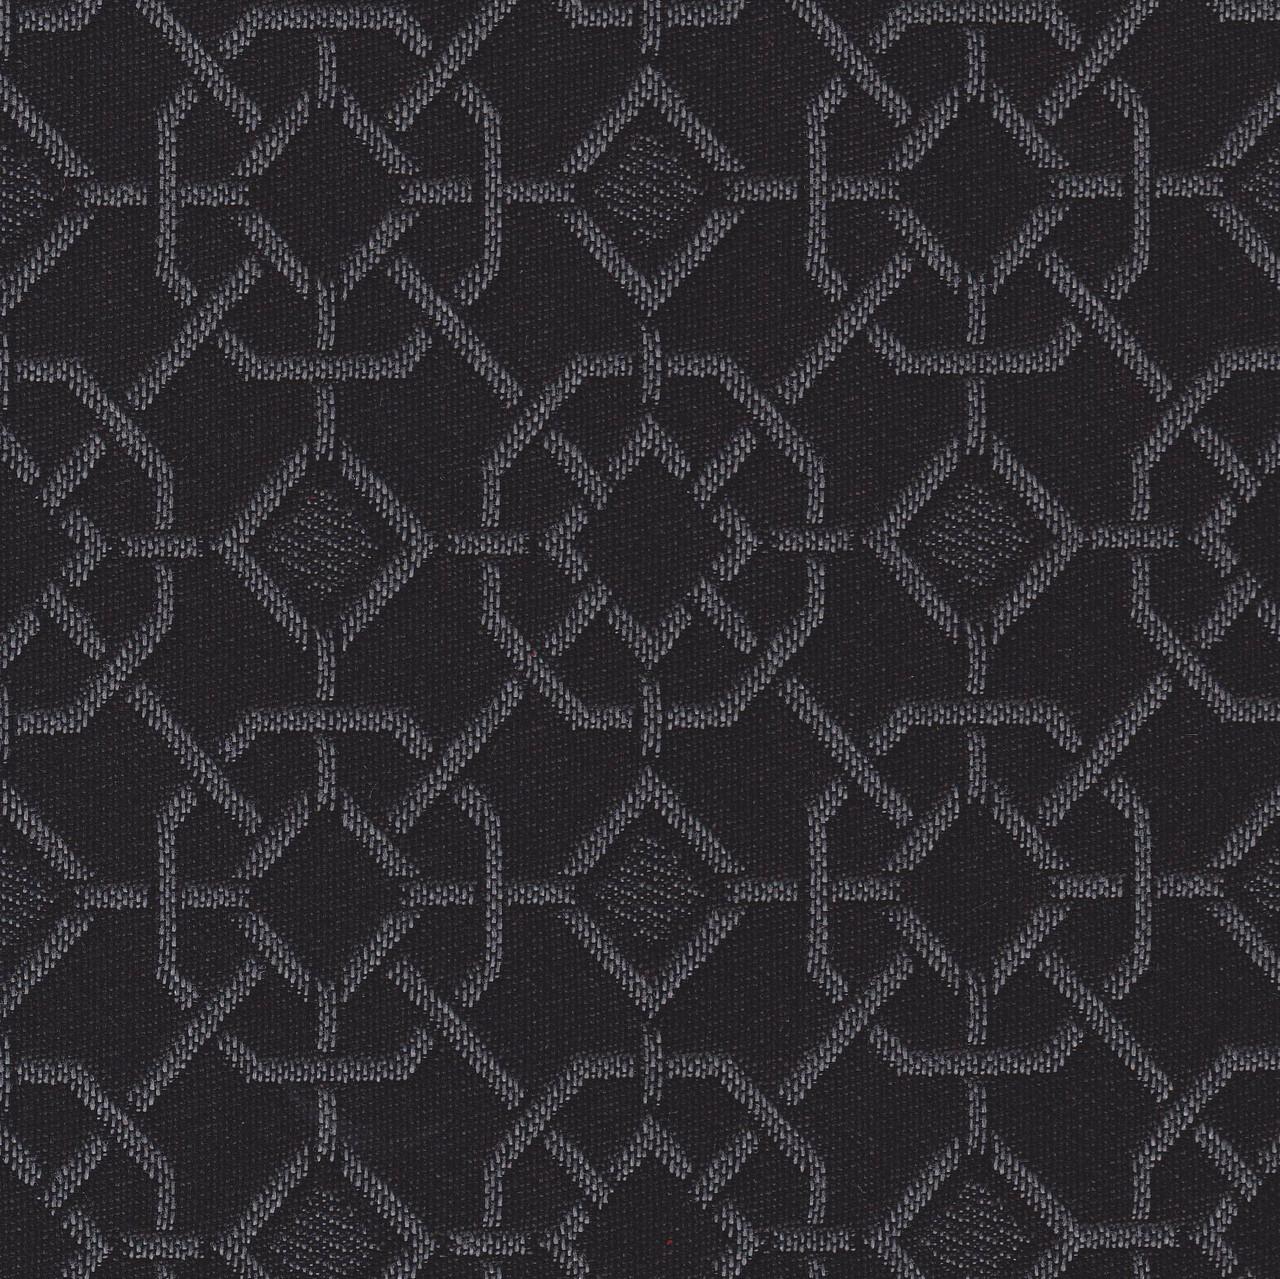 Lattice - Obsidian